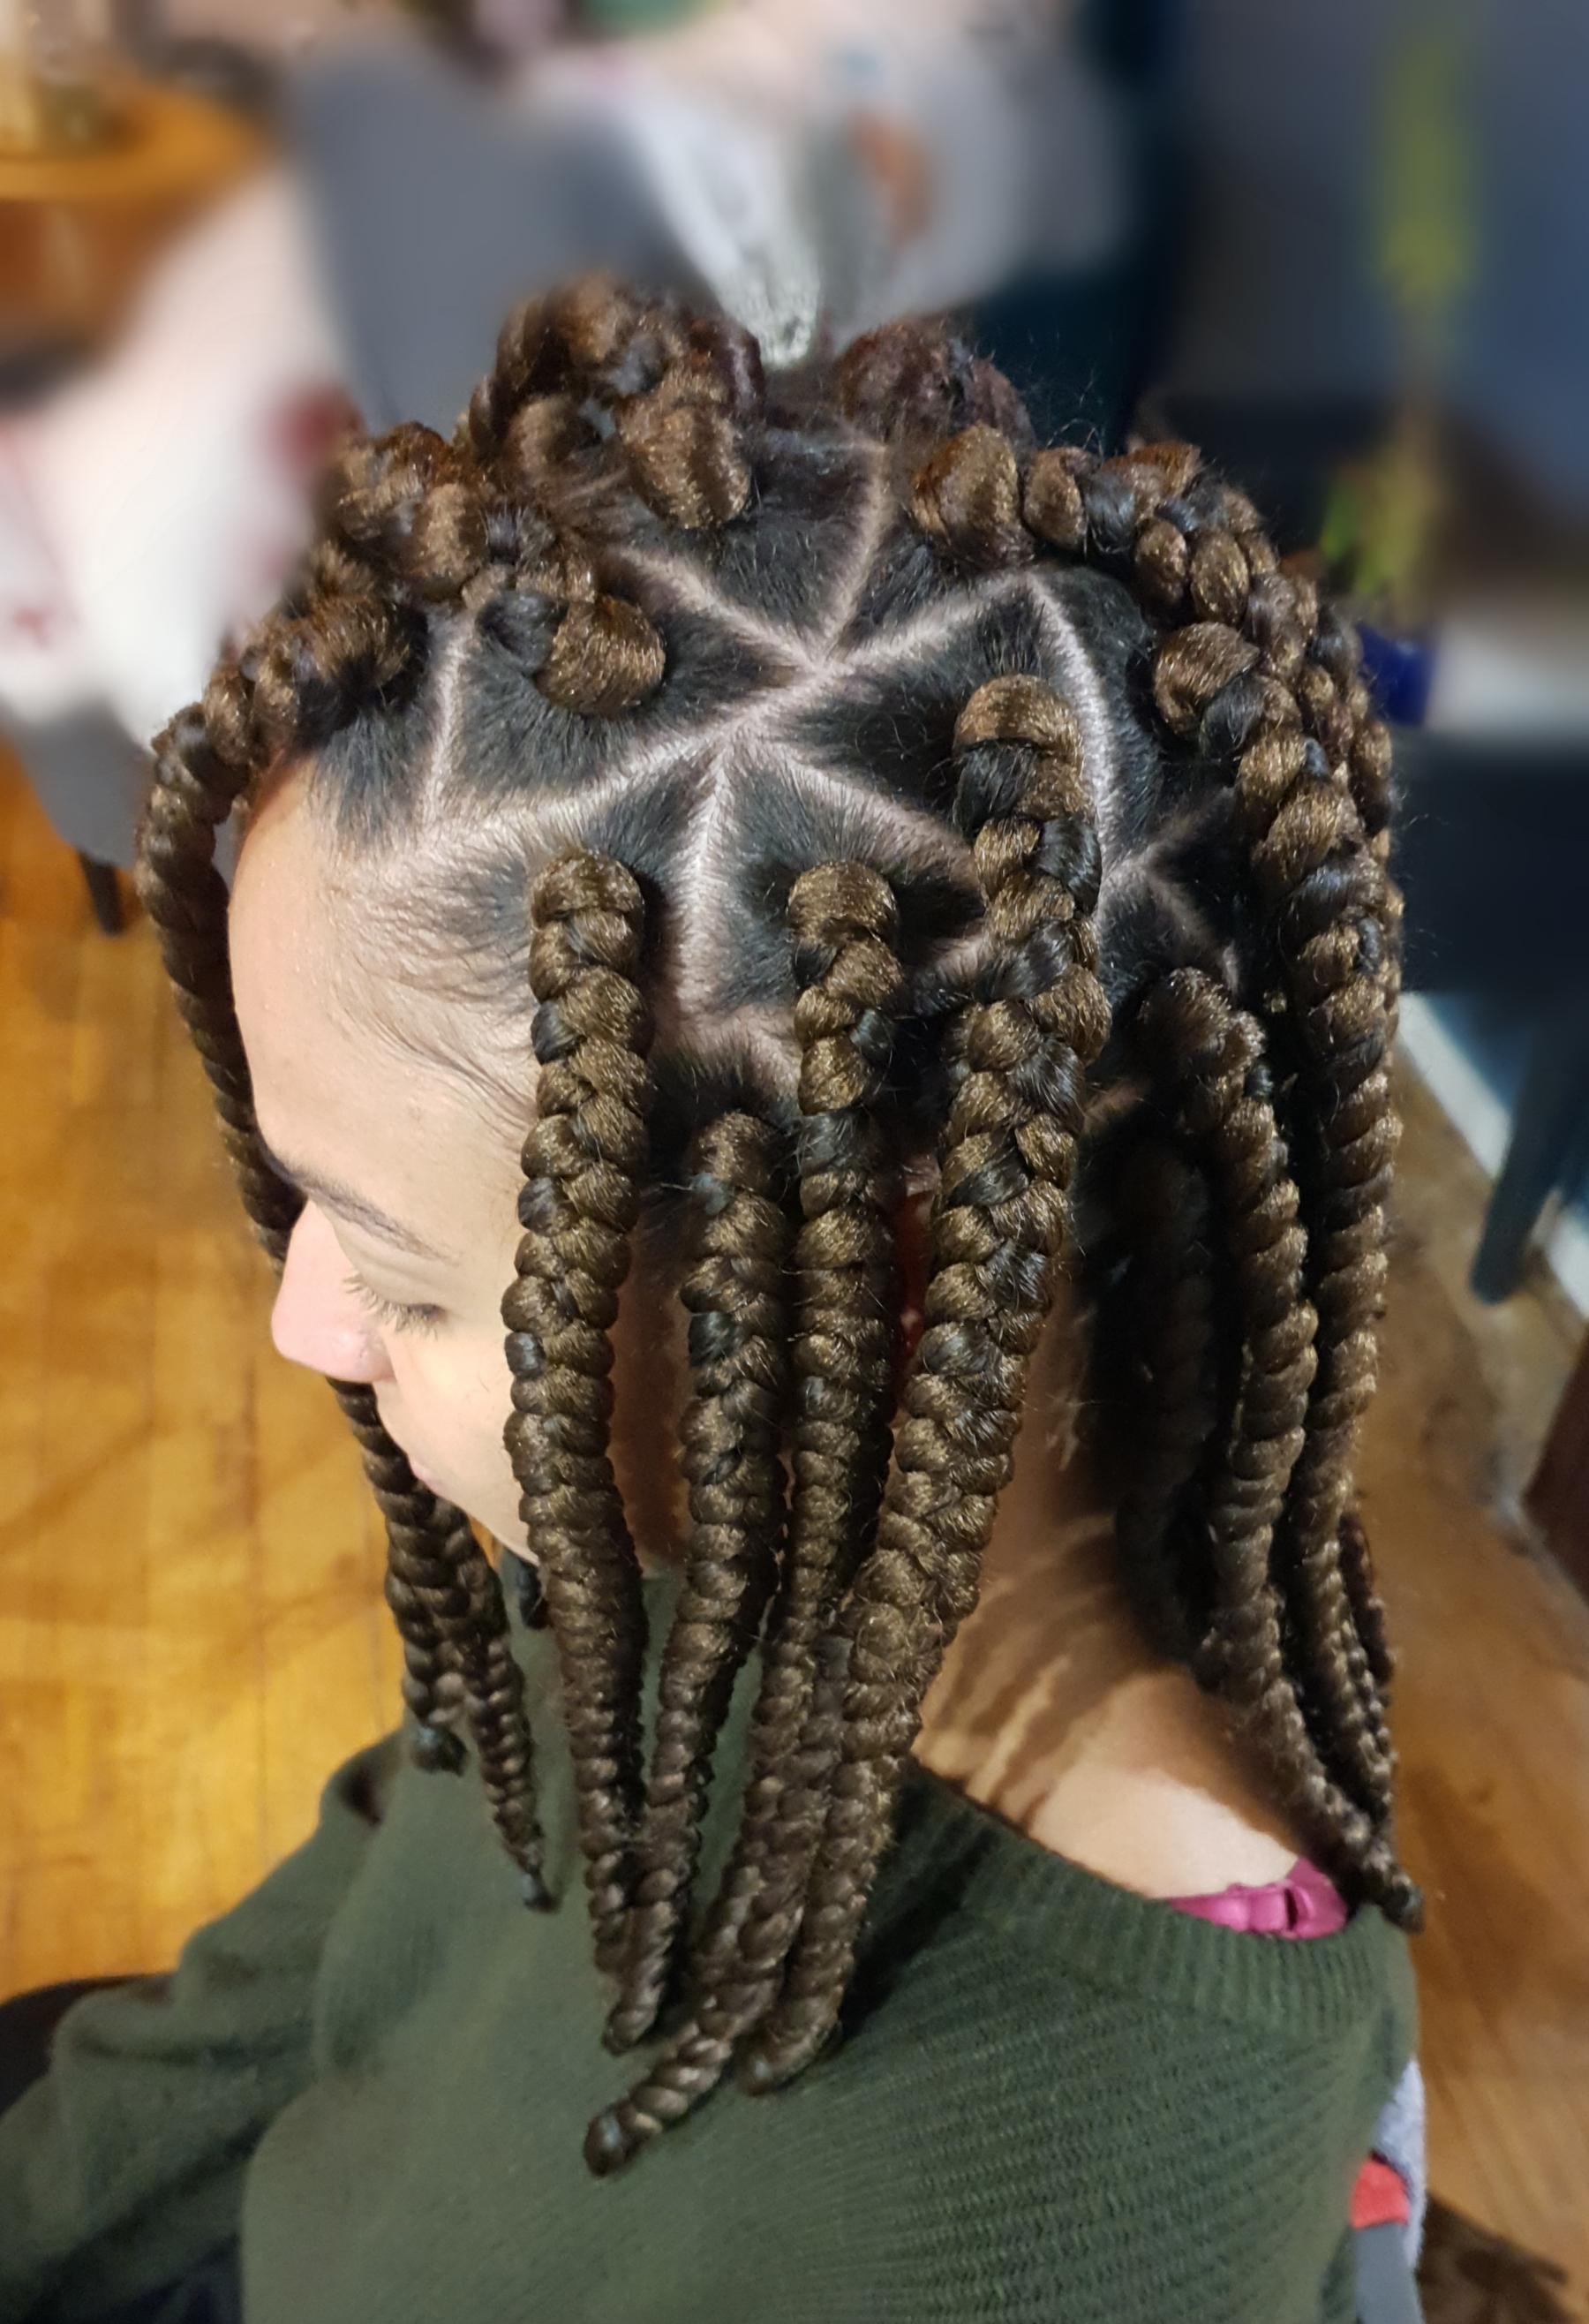 salon de coiffure afro tresse tresses box braids crochet braids vanilles tissages paris 75 77 78 91 92 93 94 95 FDBBNMVJ